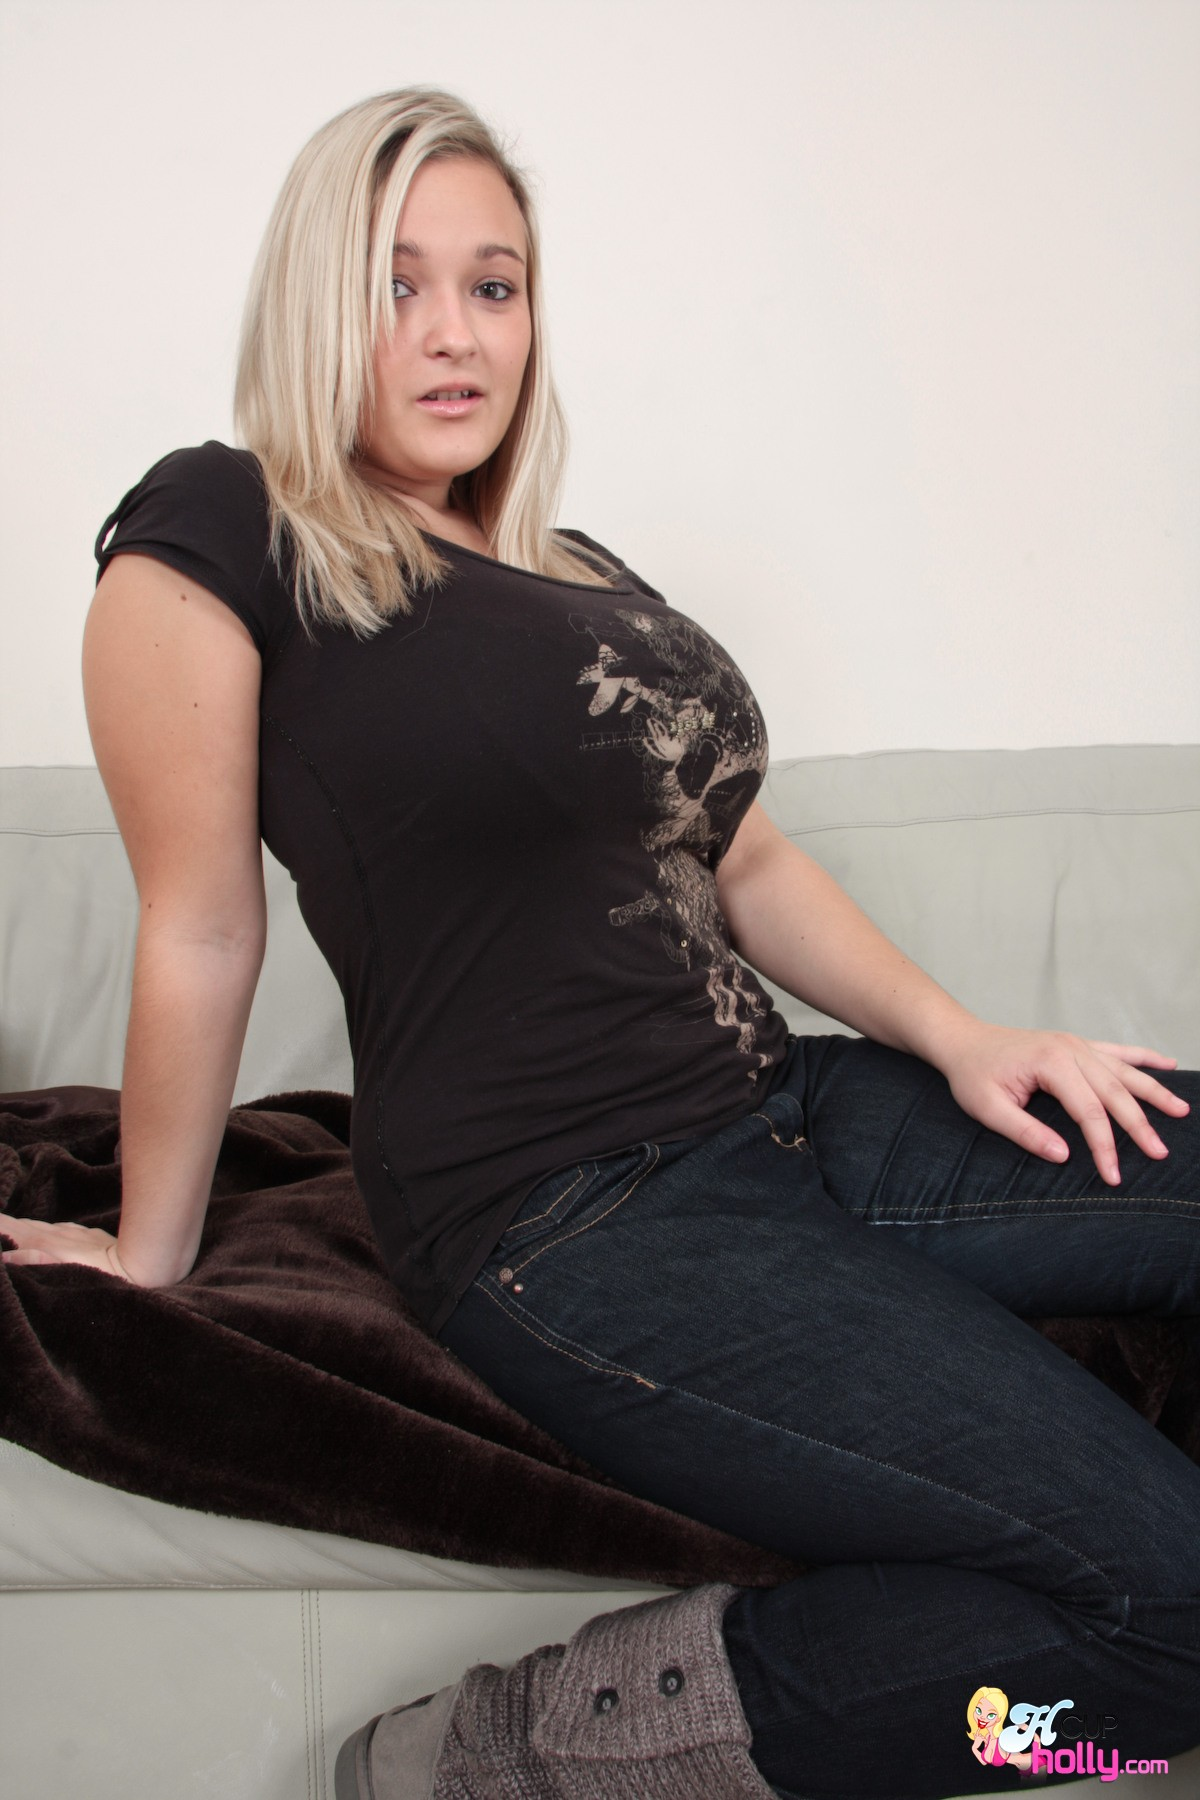 Huge boobs in tight shirt